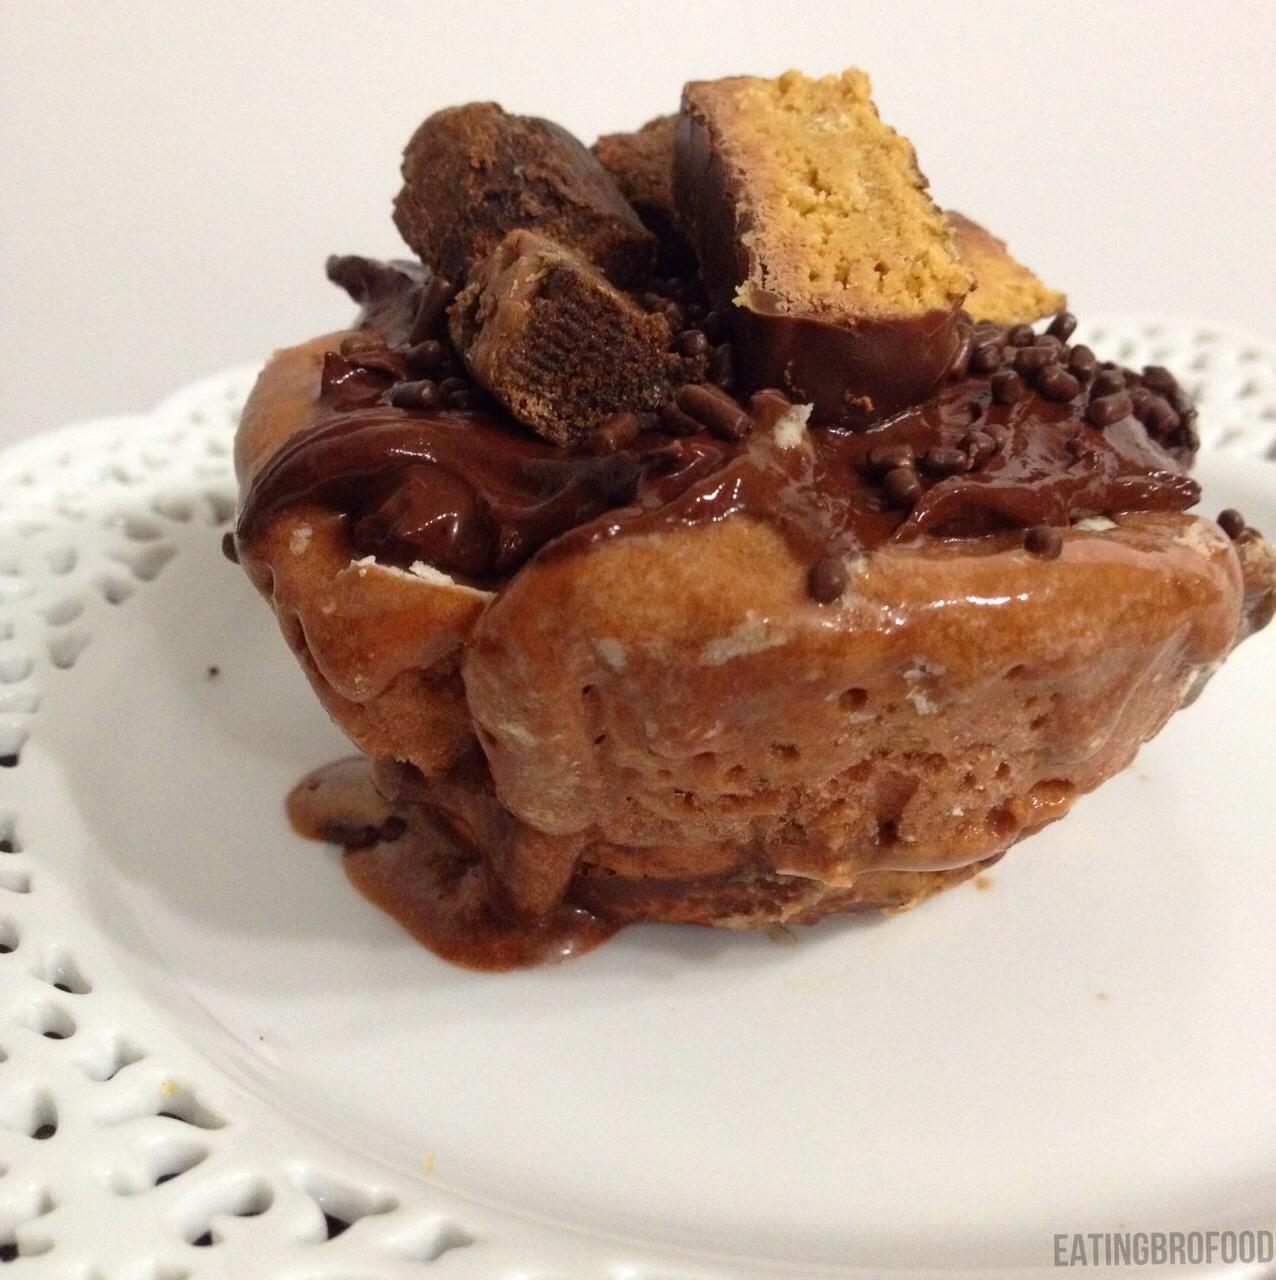 Chocolate Peanut Butter Powder Protein Cake